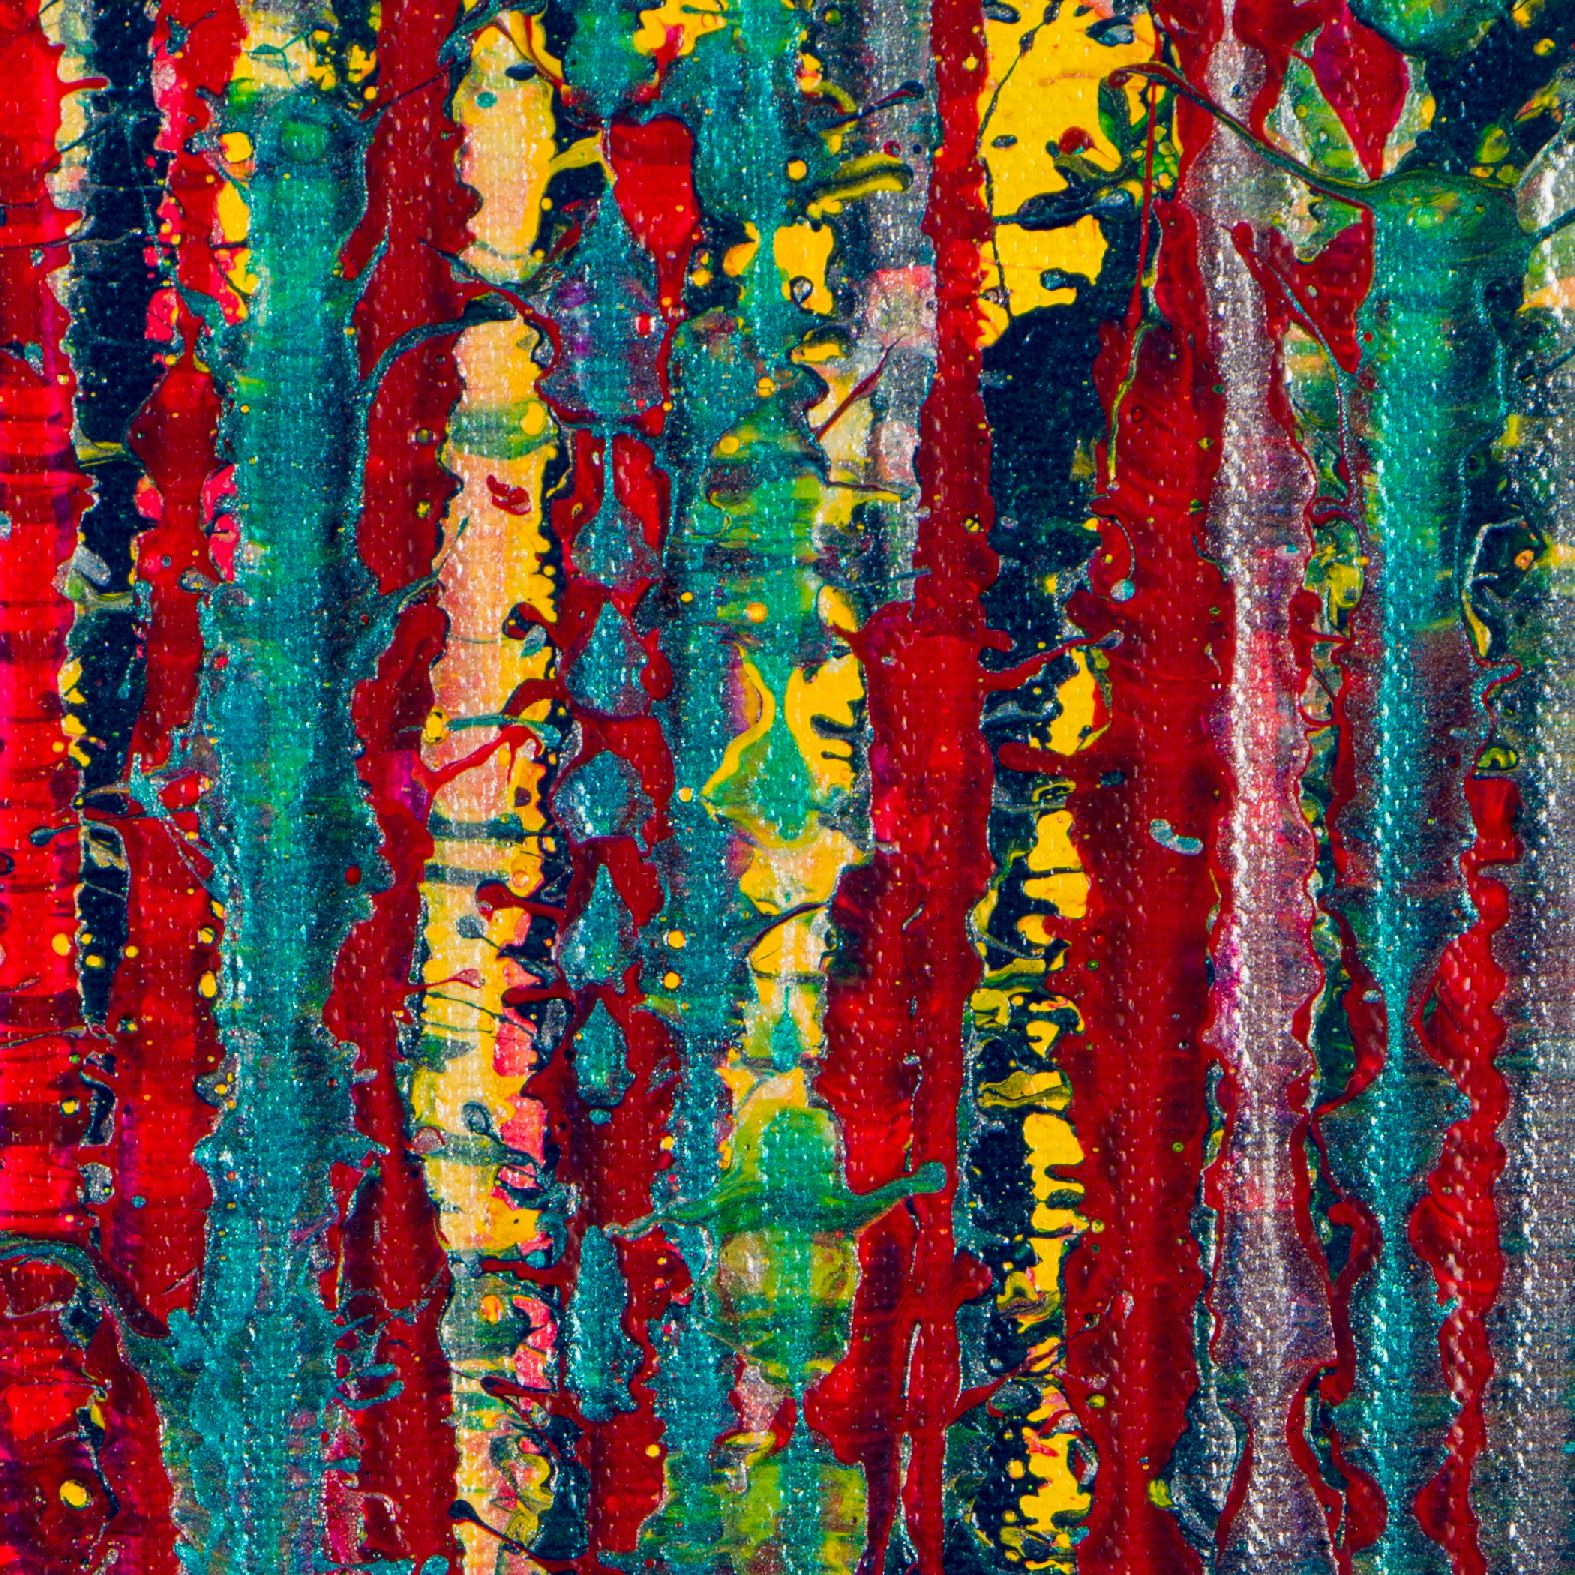 Detail - Garden In Motion 5 (2020) by Nestor Toro